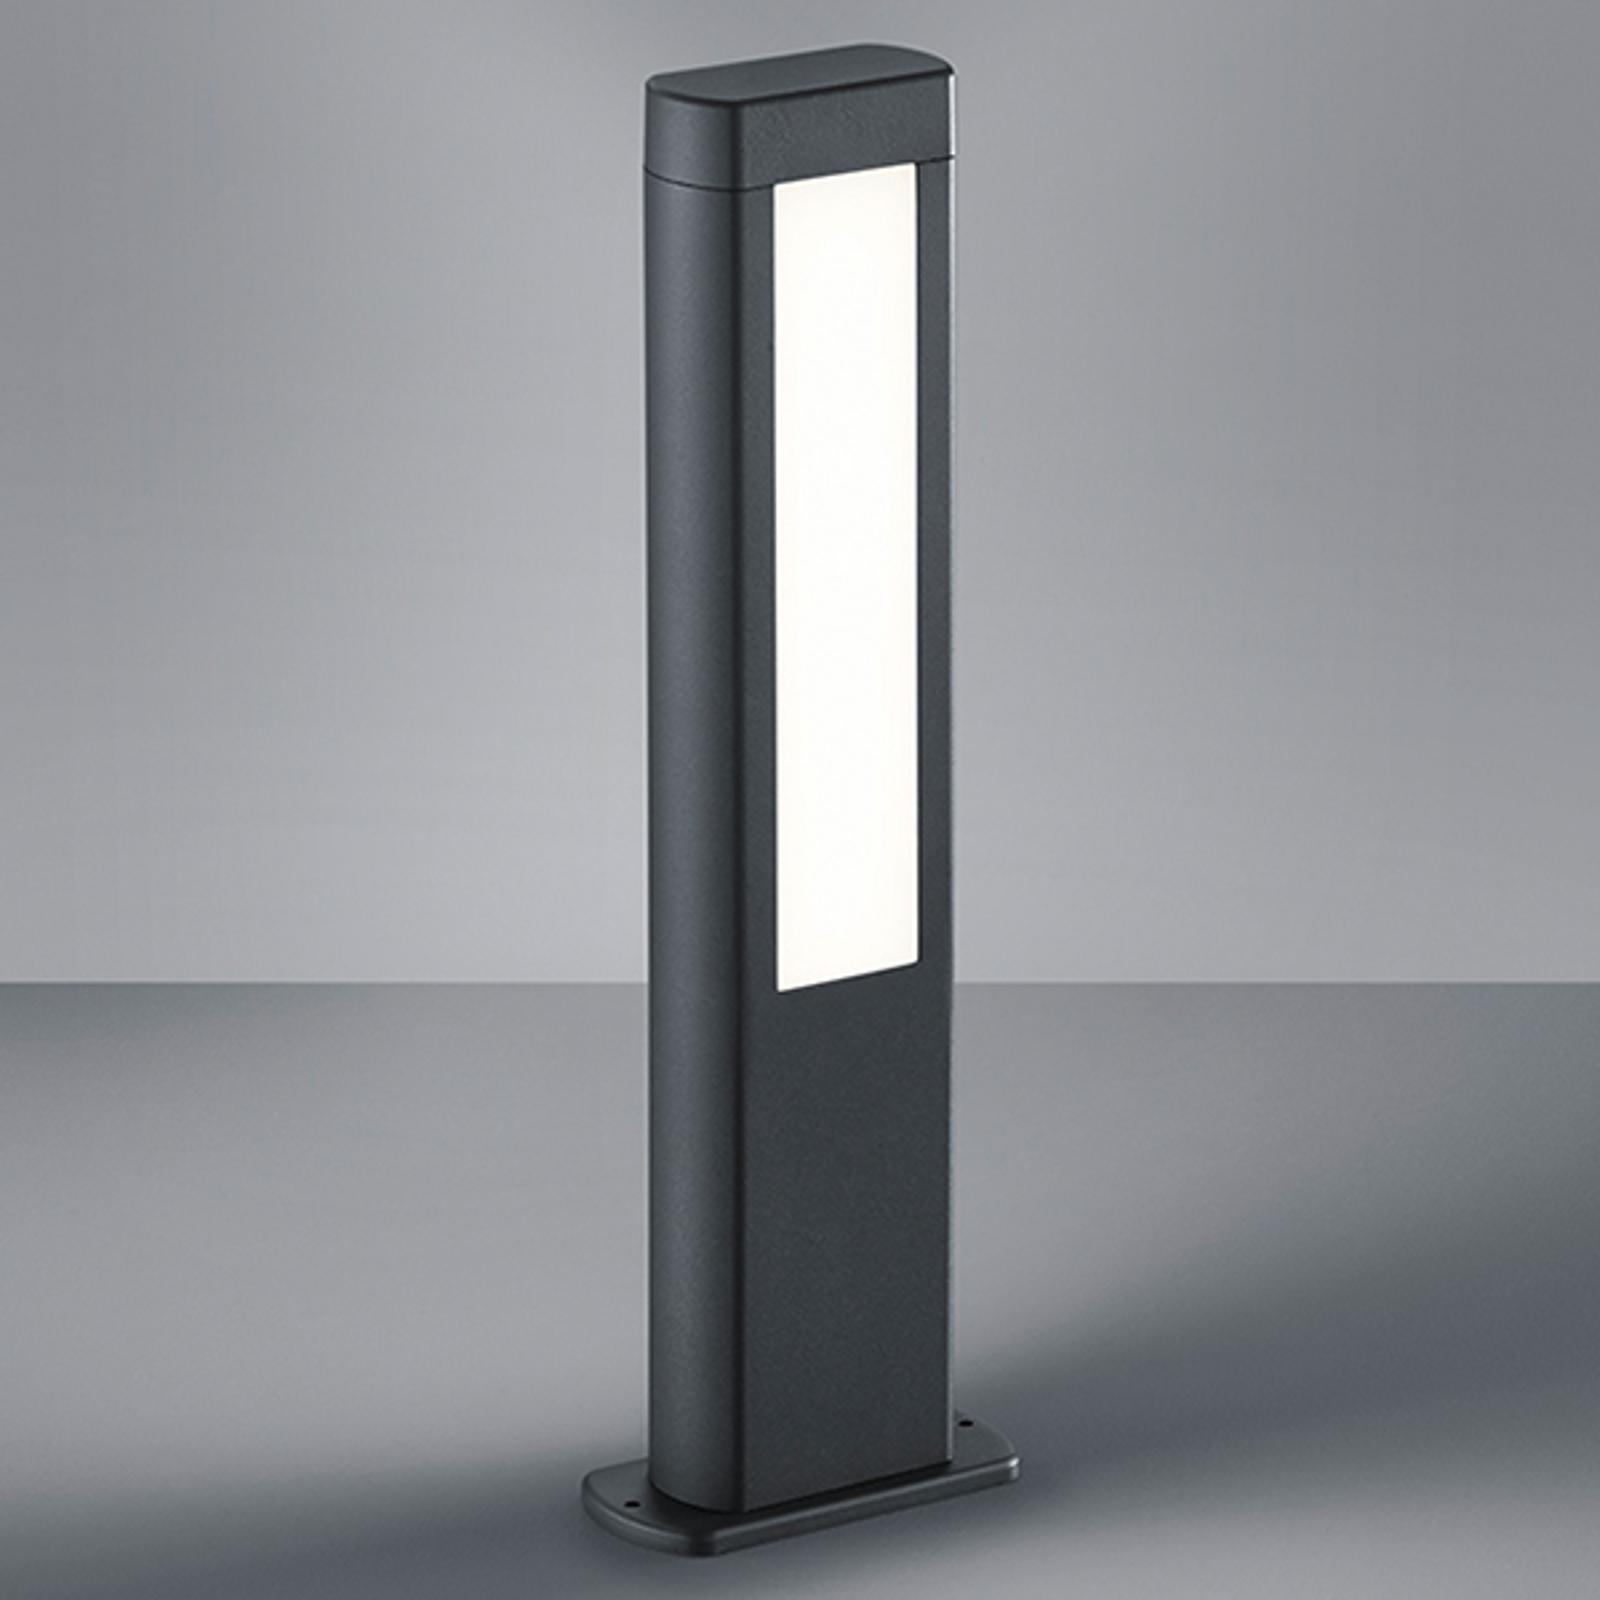 Altezza 50 cm - lampione a LED Rhine